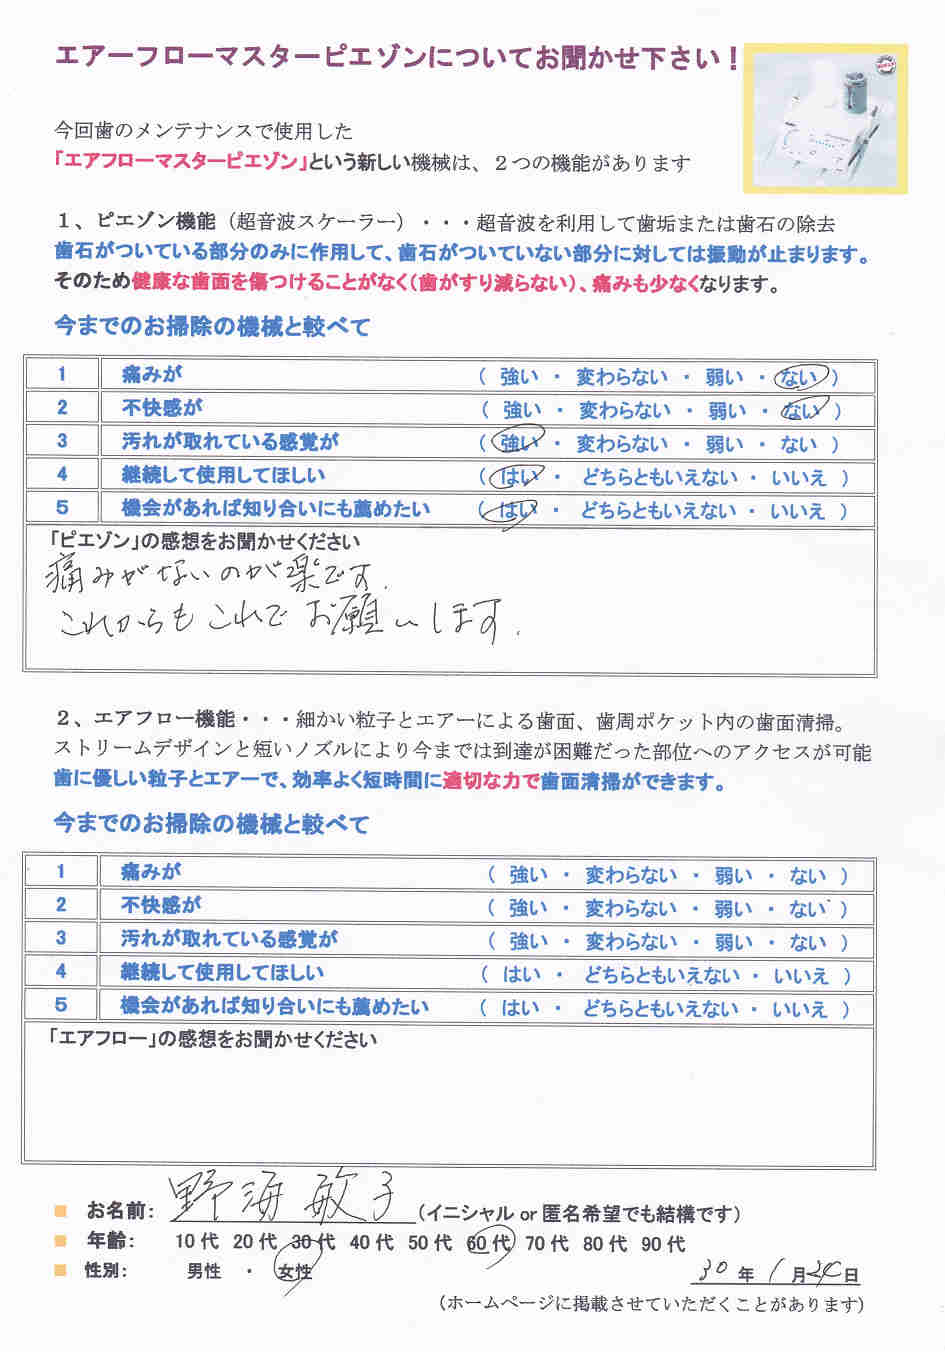 http://www.hayashi-dental.info/resize1222.jpg